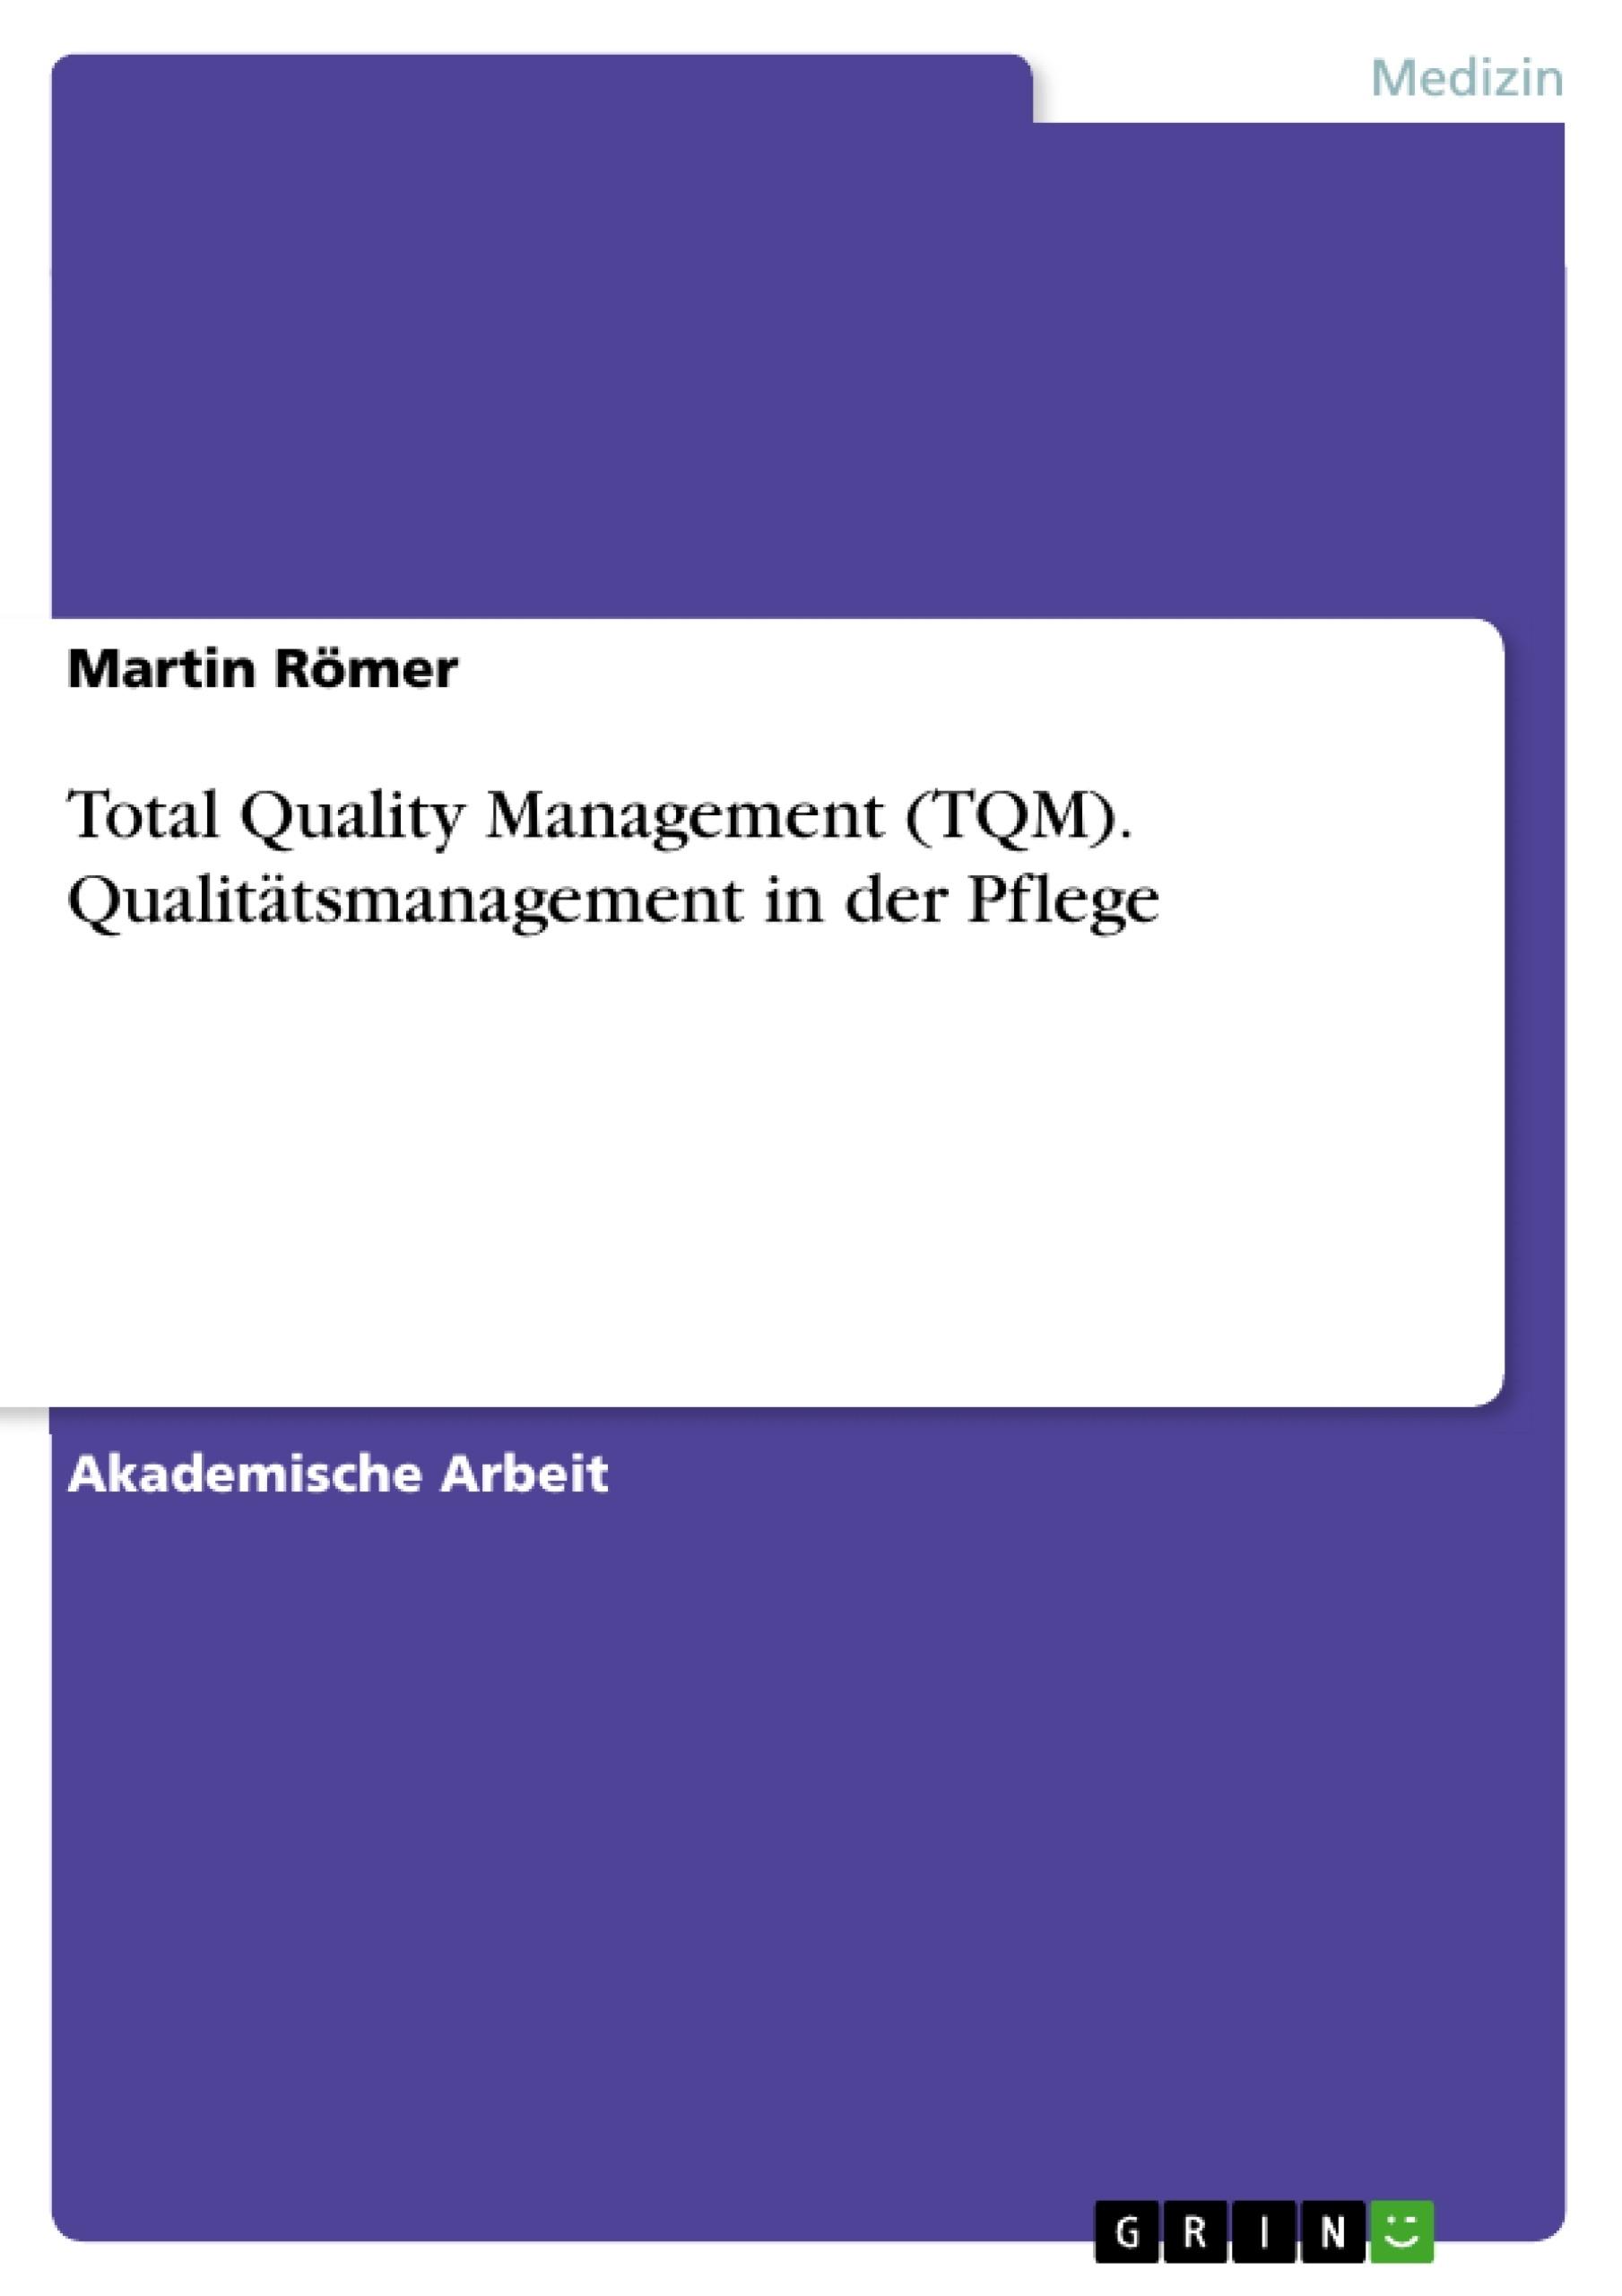 Titel: Total Quality Management (TQM). Qualitätsmanagement in der Pflege